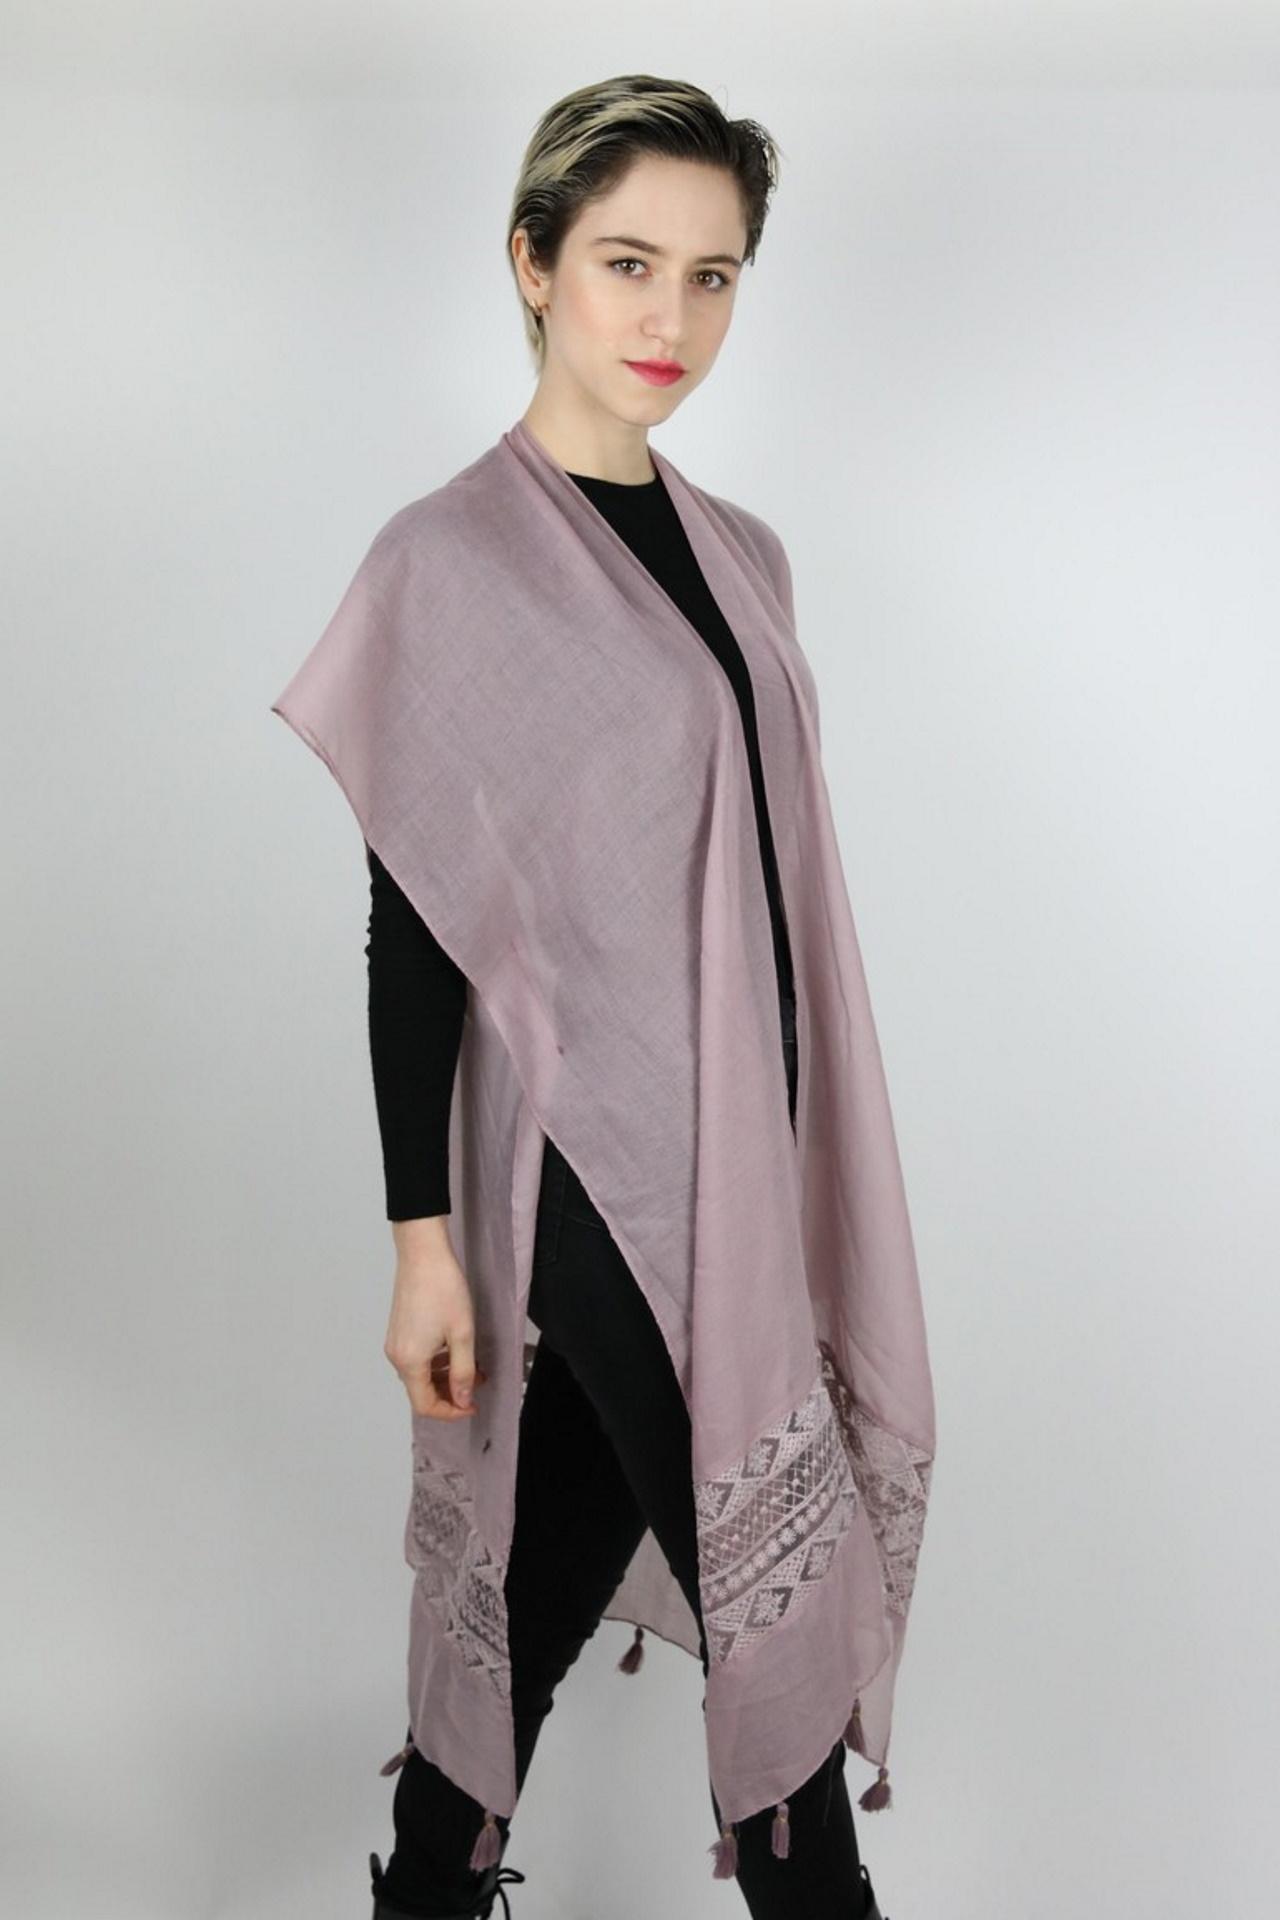 CLOTHES172 STOLA DONNA FOULARD CARDIGAN COPRISPALLE 3 1stAmerican elegante stola da donna foulard cardigan coprispalle